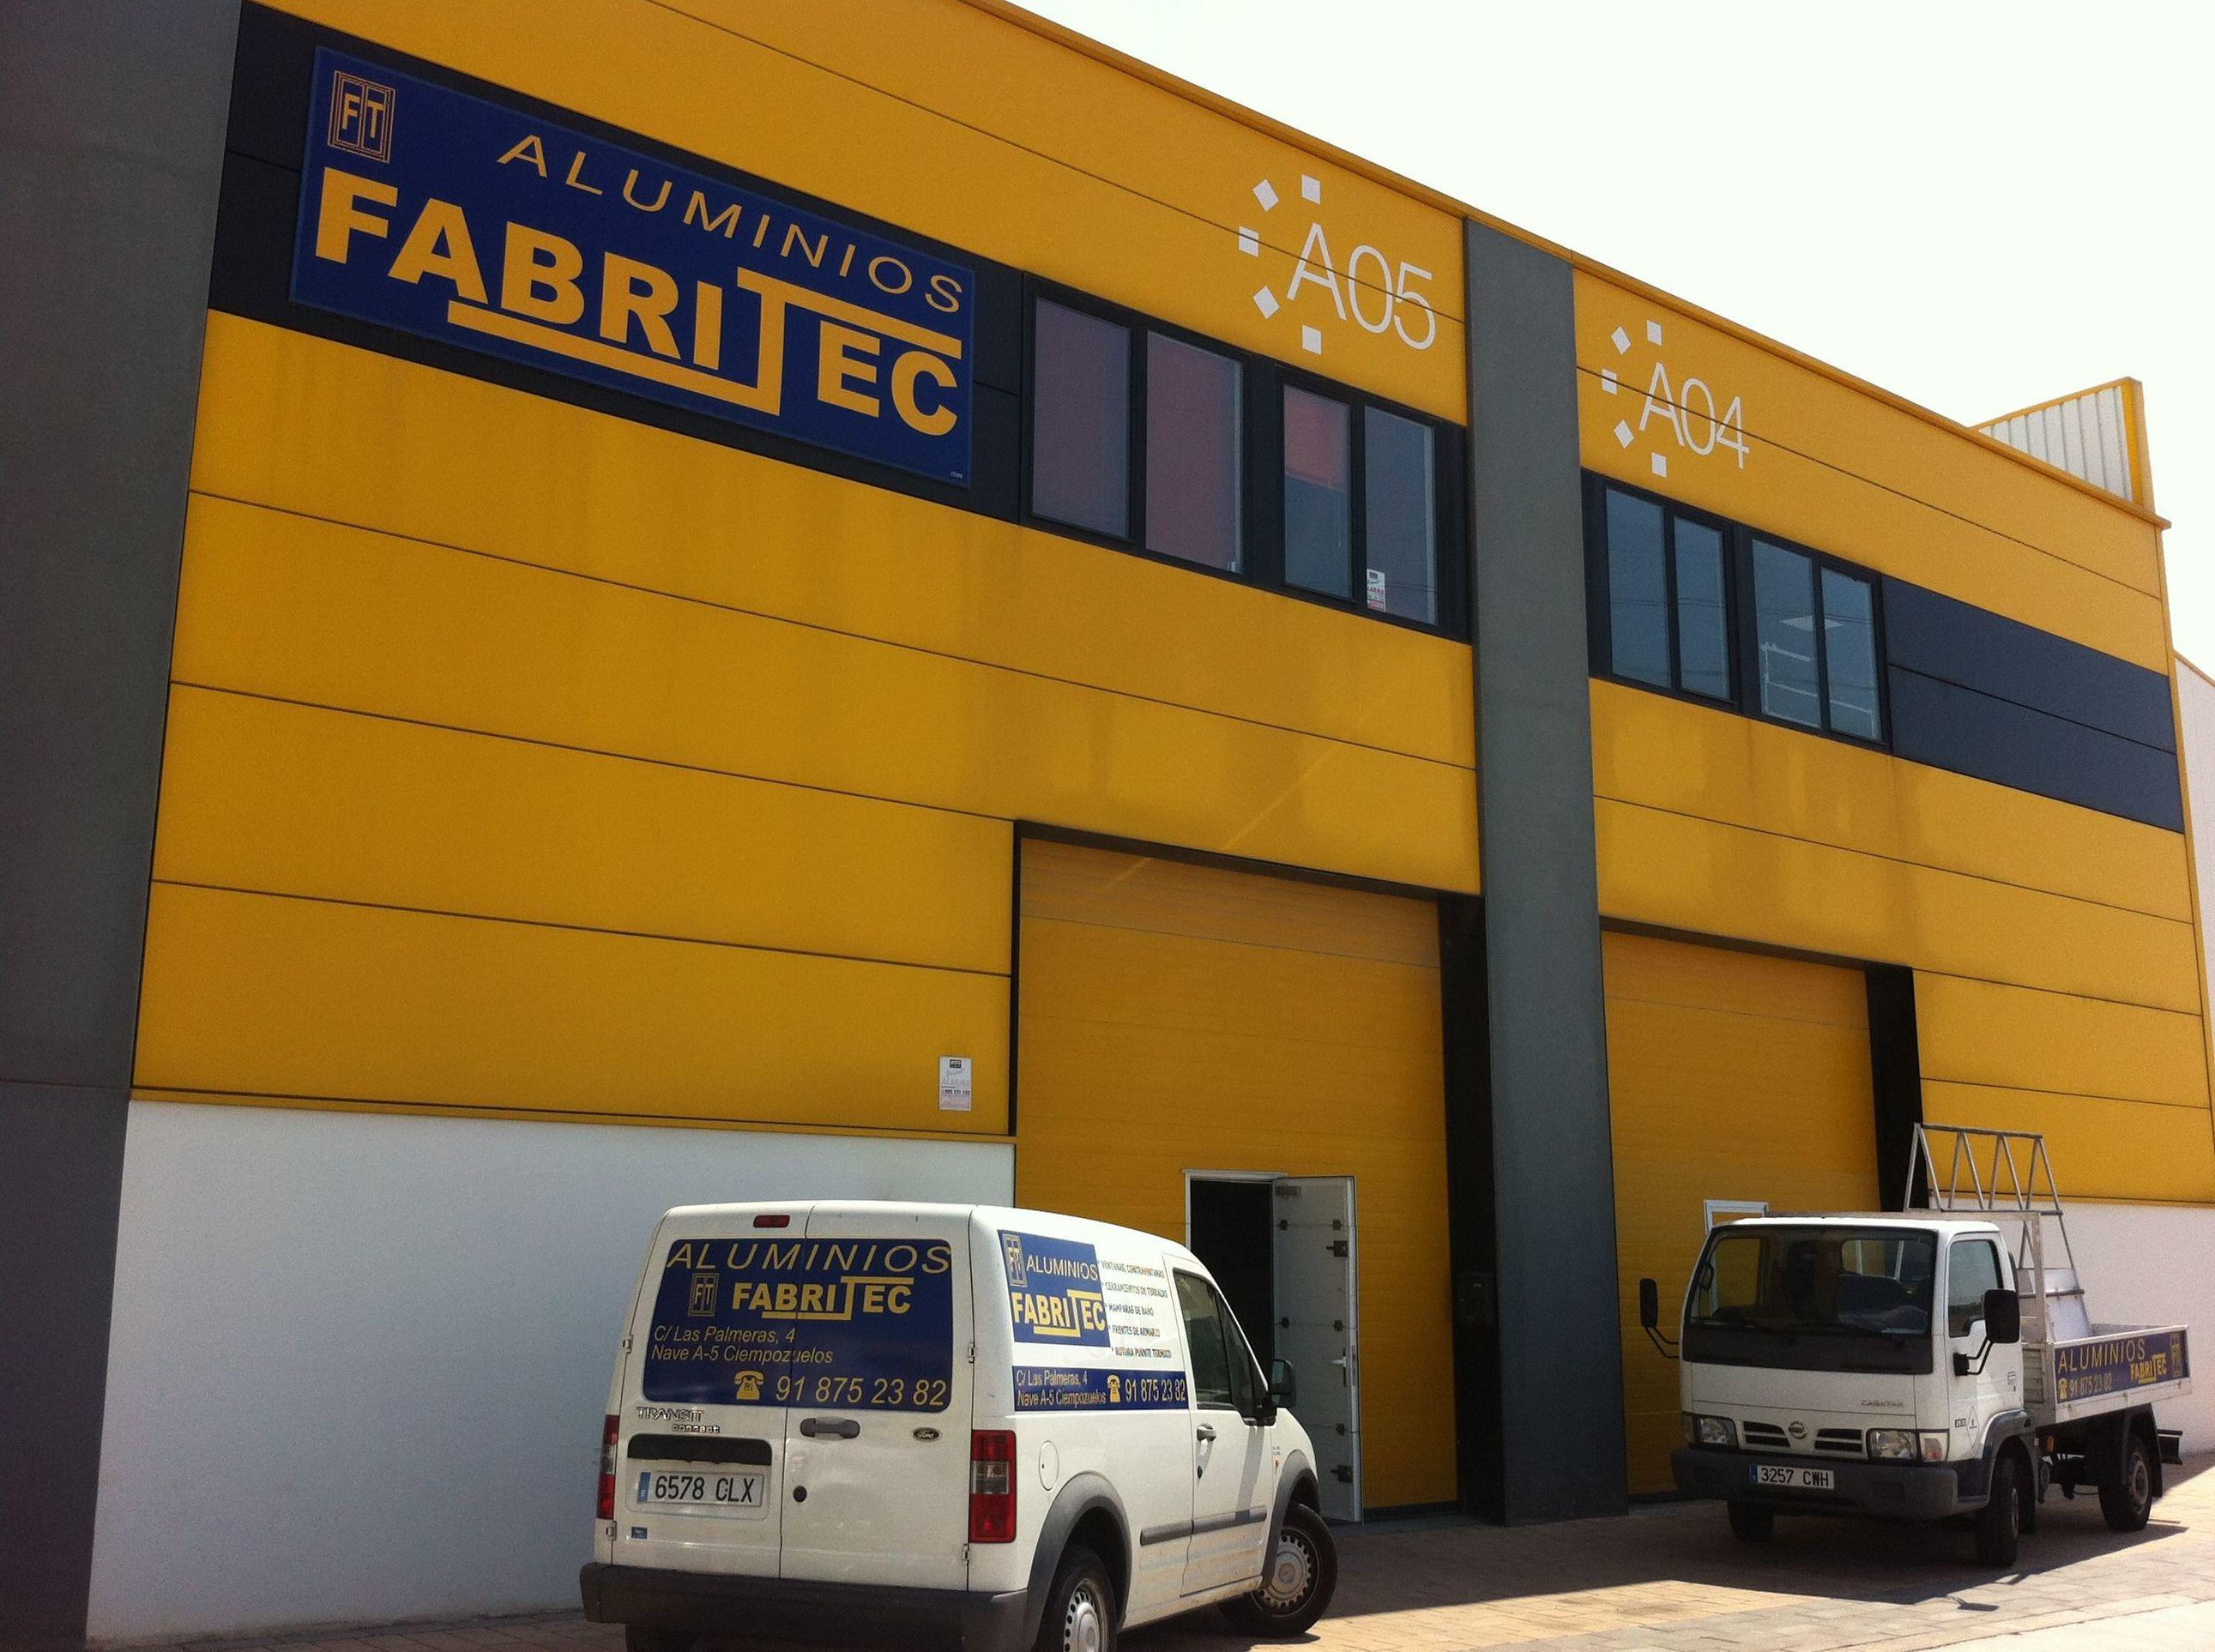 Precio ventanas aluminio climalit precio ventanas - Precios ventanas climalit ...